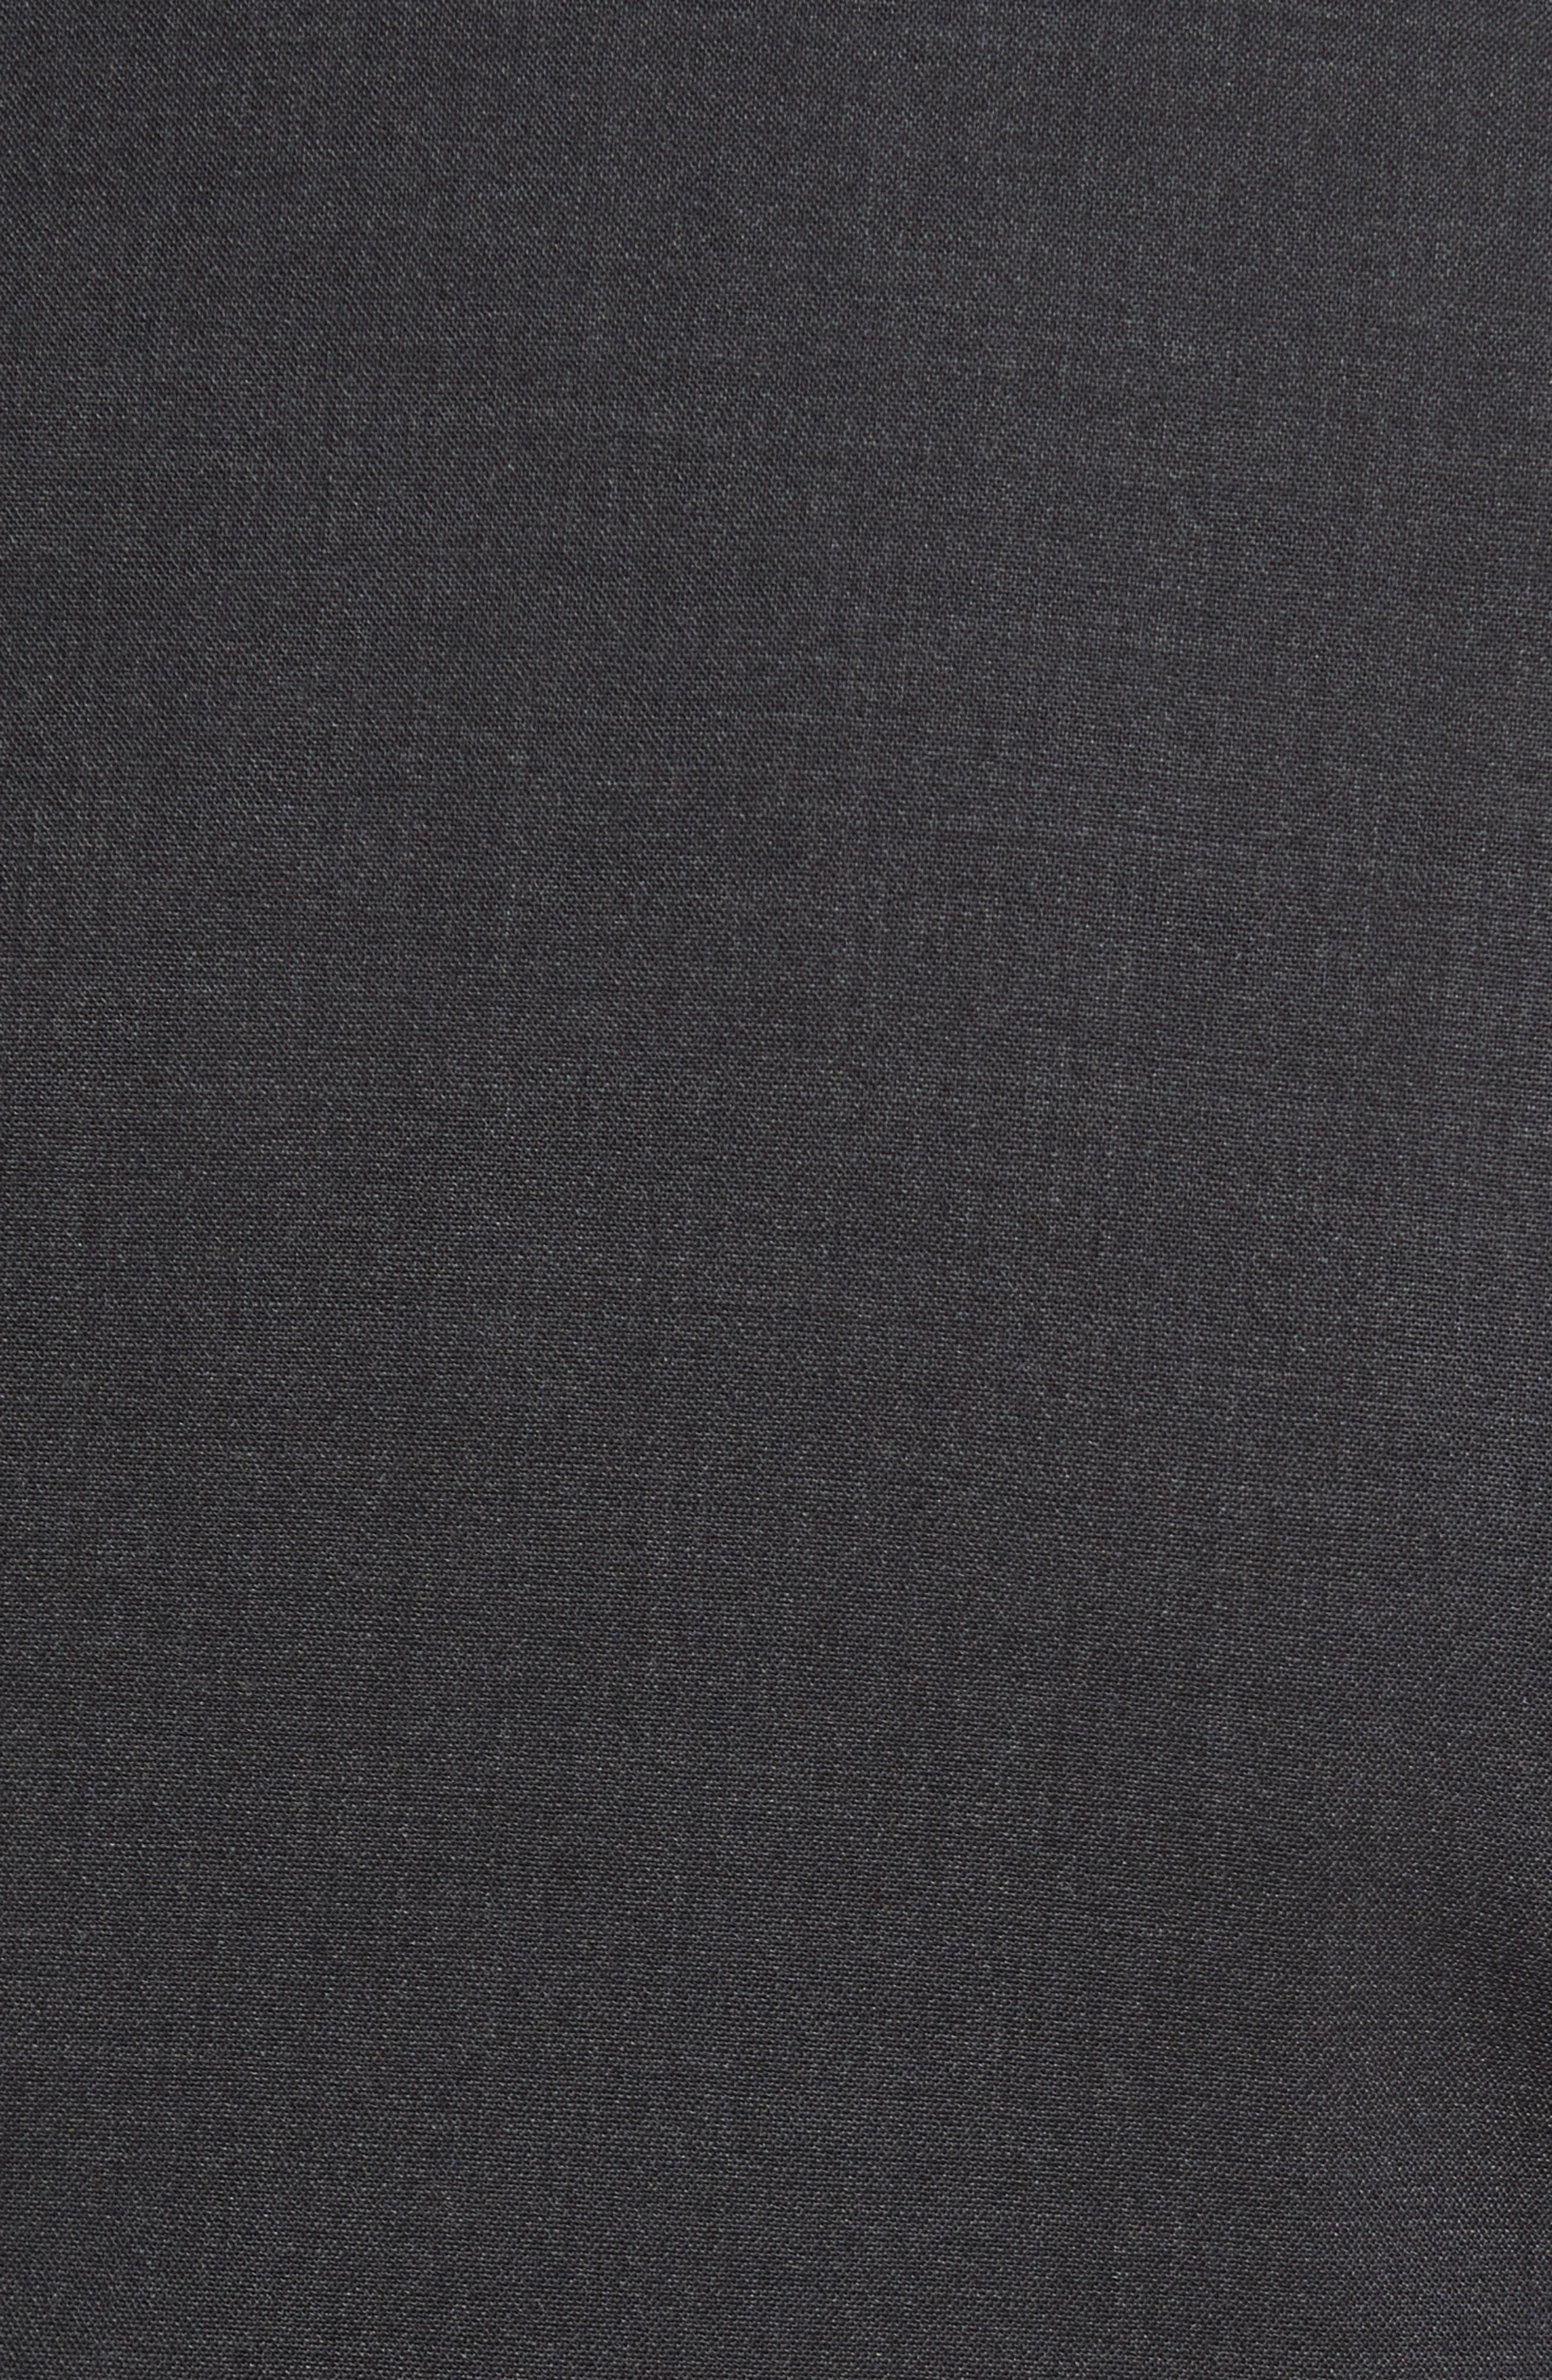 Wellar New Tailor 1 Trim Fit Stretch Wool Sport Coat,                             Alternate thumbnail 5, color,                             Dark Charcoal